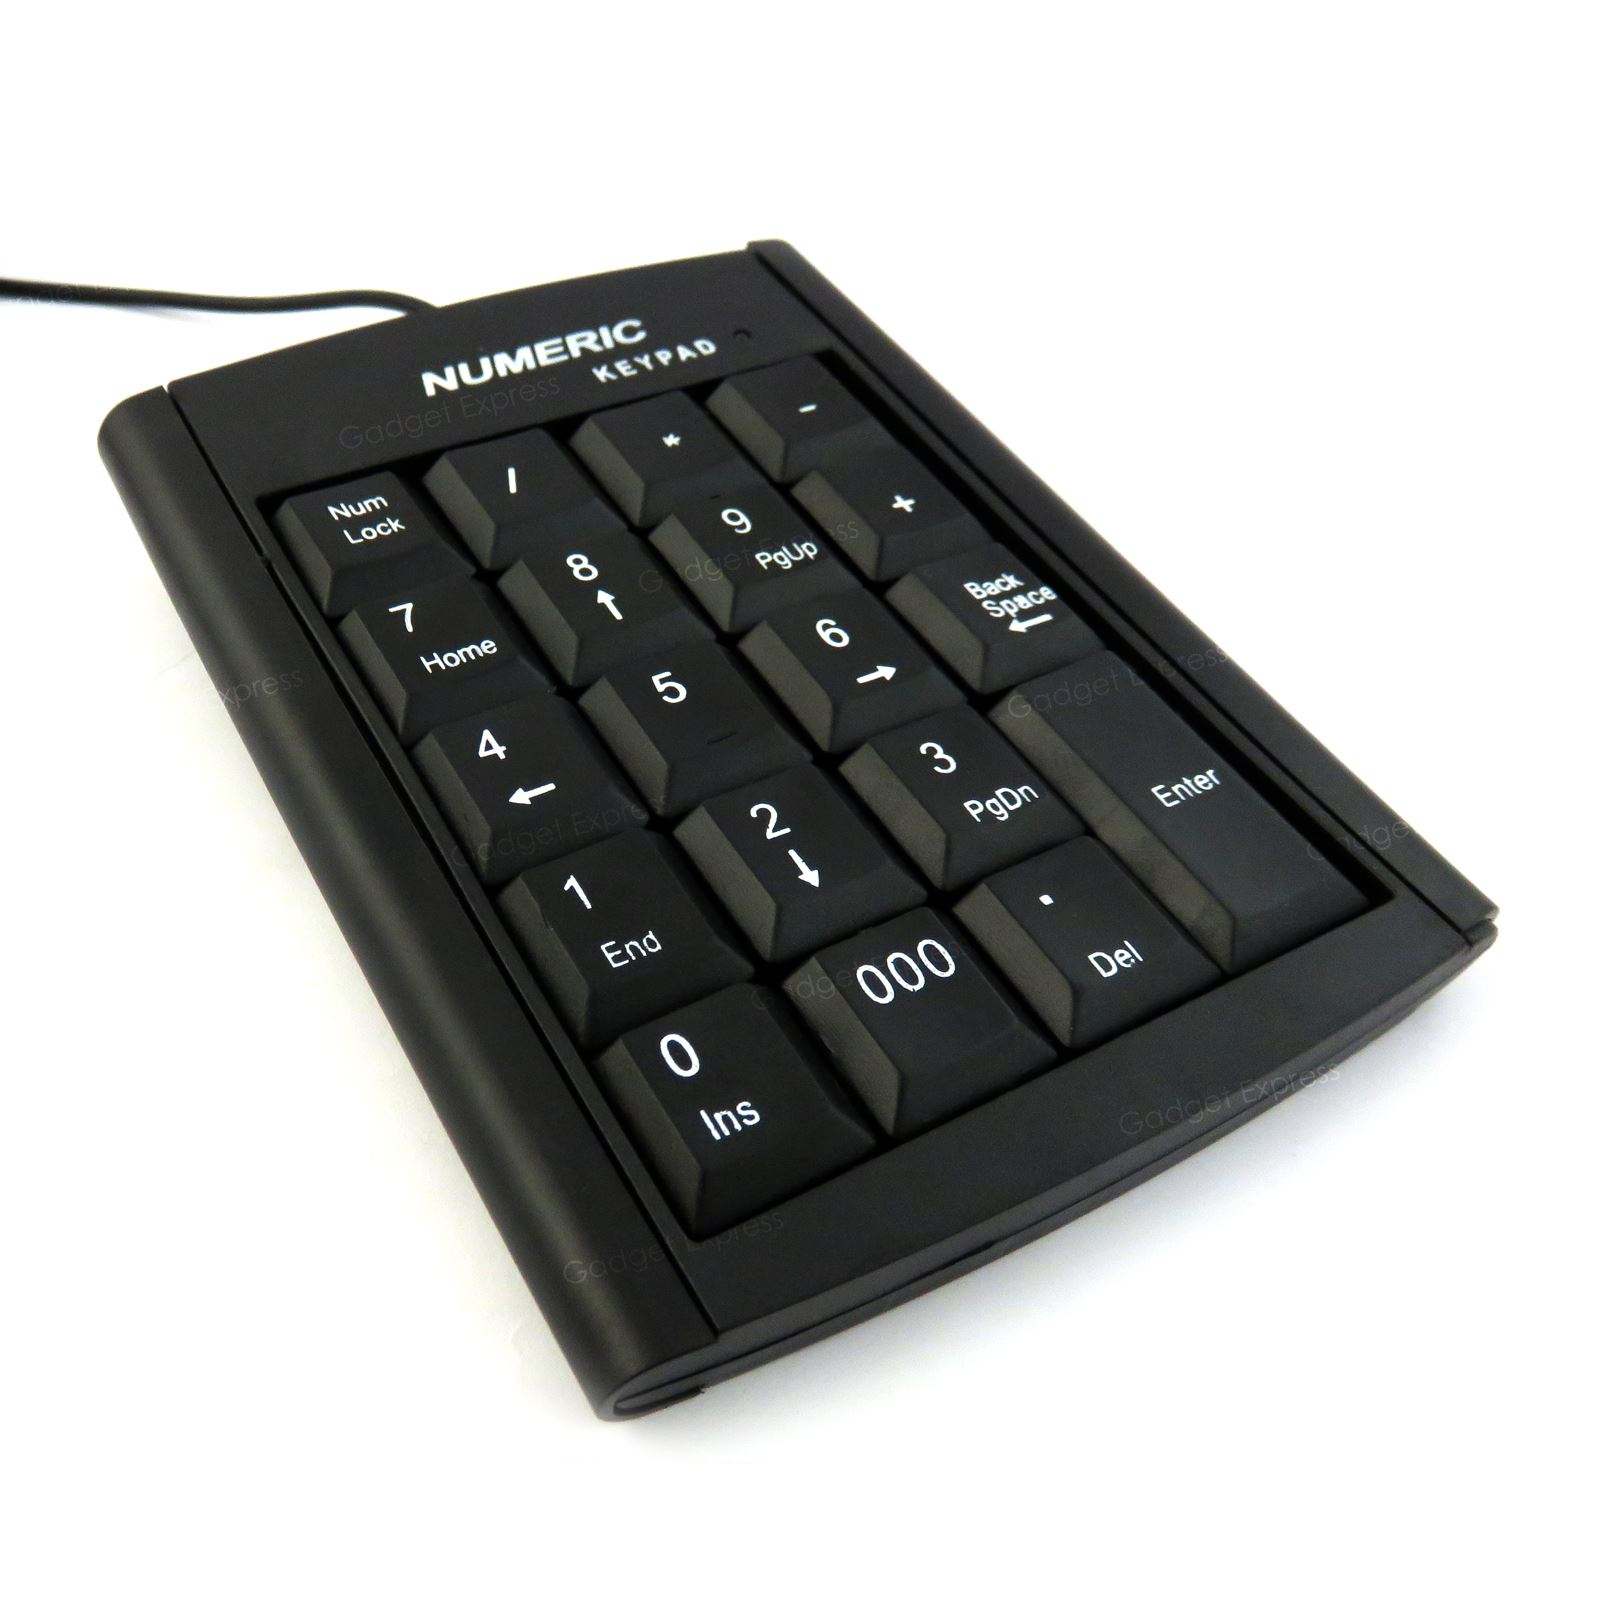 Numeric Keypad Number 19 Keys Pad Keyboard Accounting USB ...